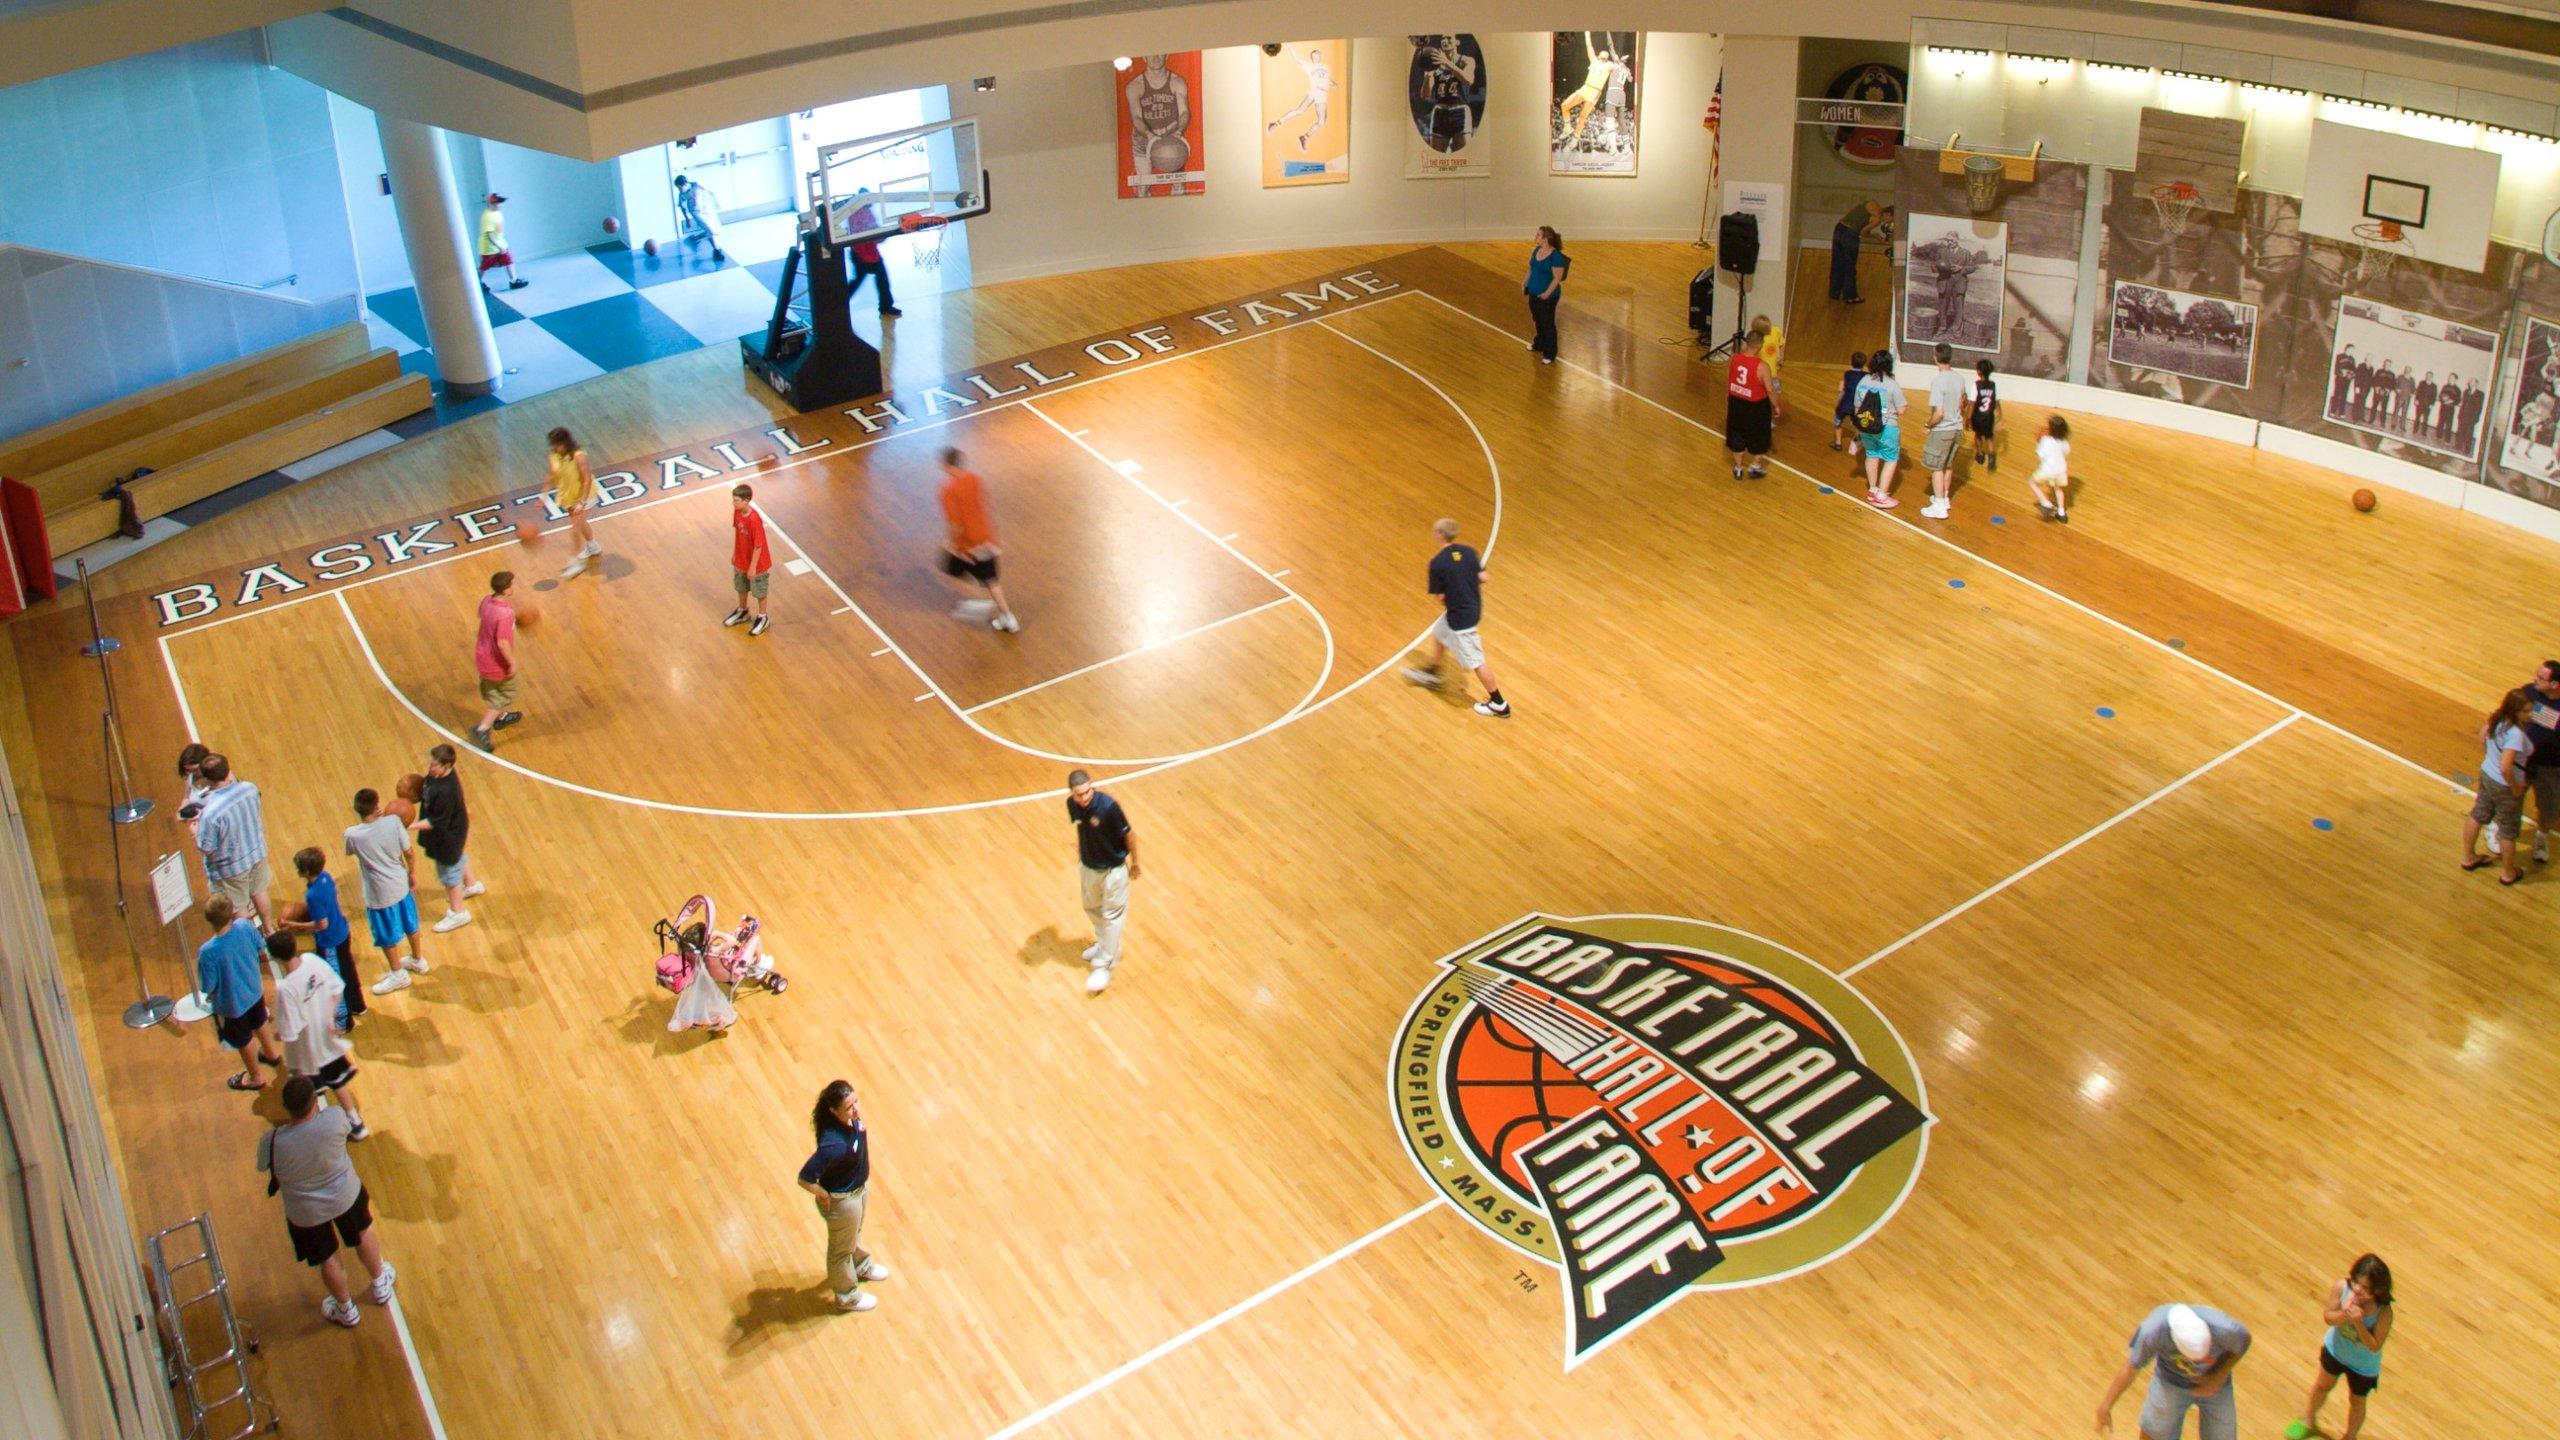 Naismith Memorial Basketball Hall of Fame, Springfield, Massachusetts, United States of America